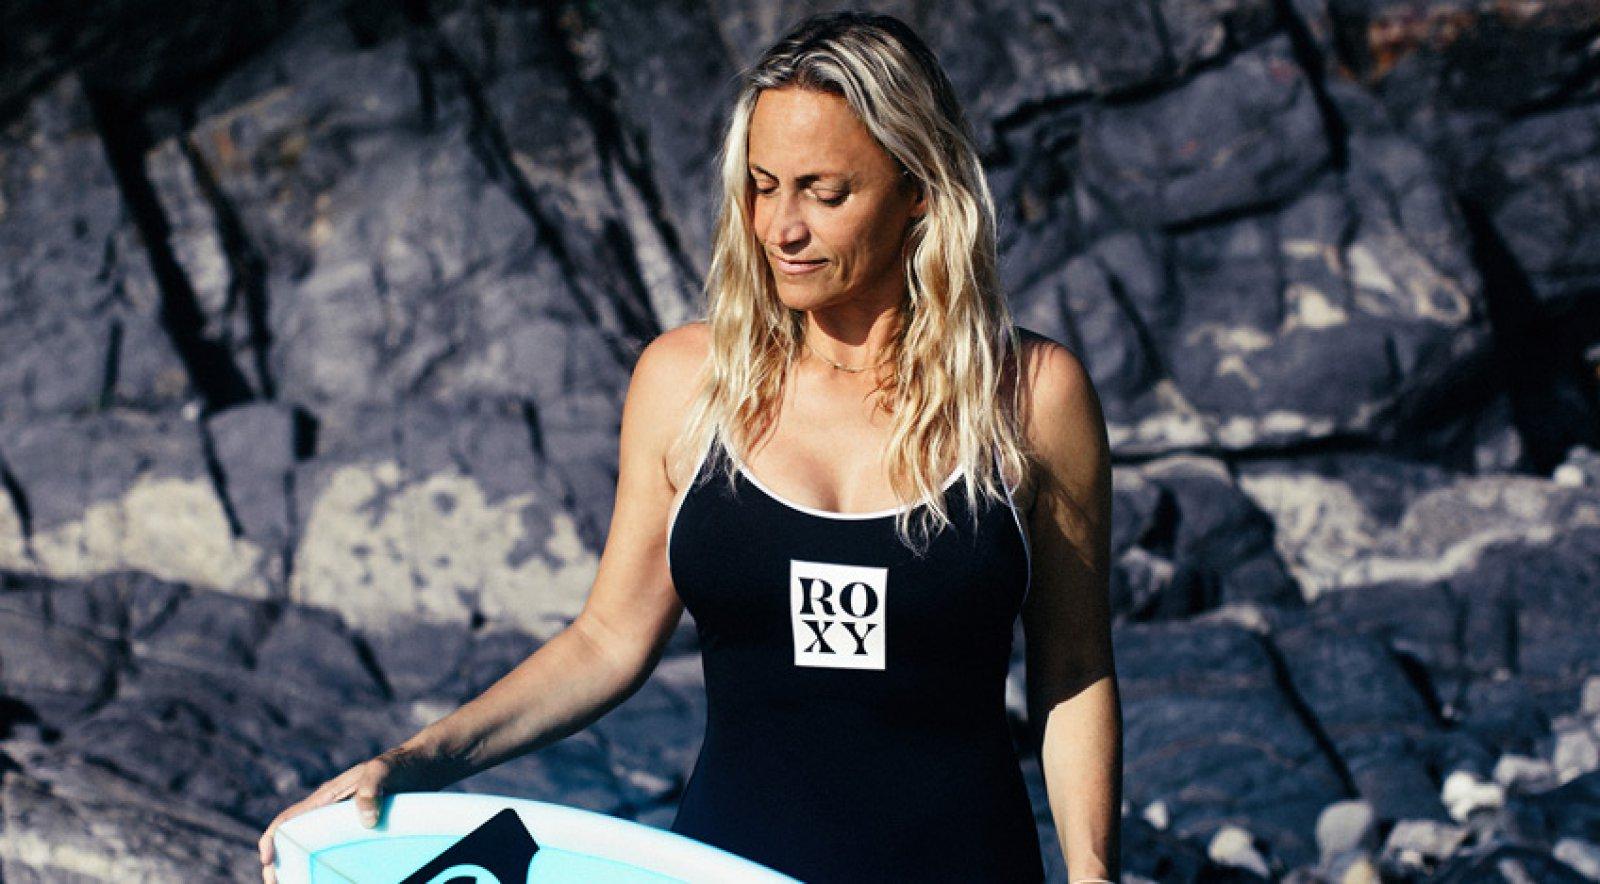 World Champion Surfer Lisa Anderson